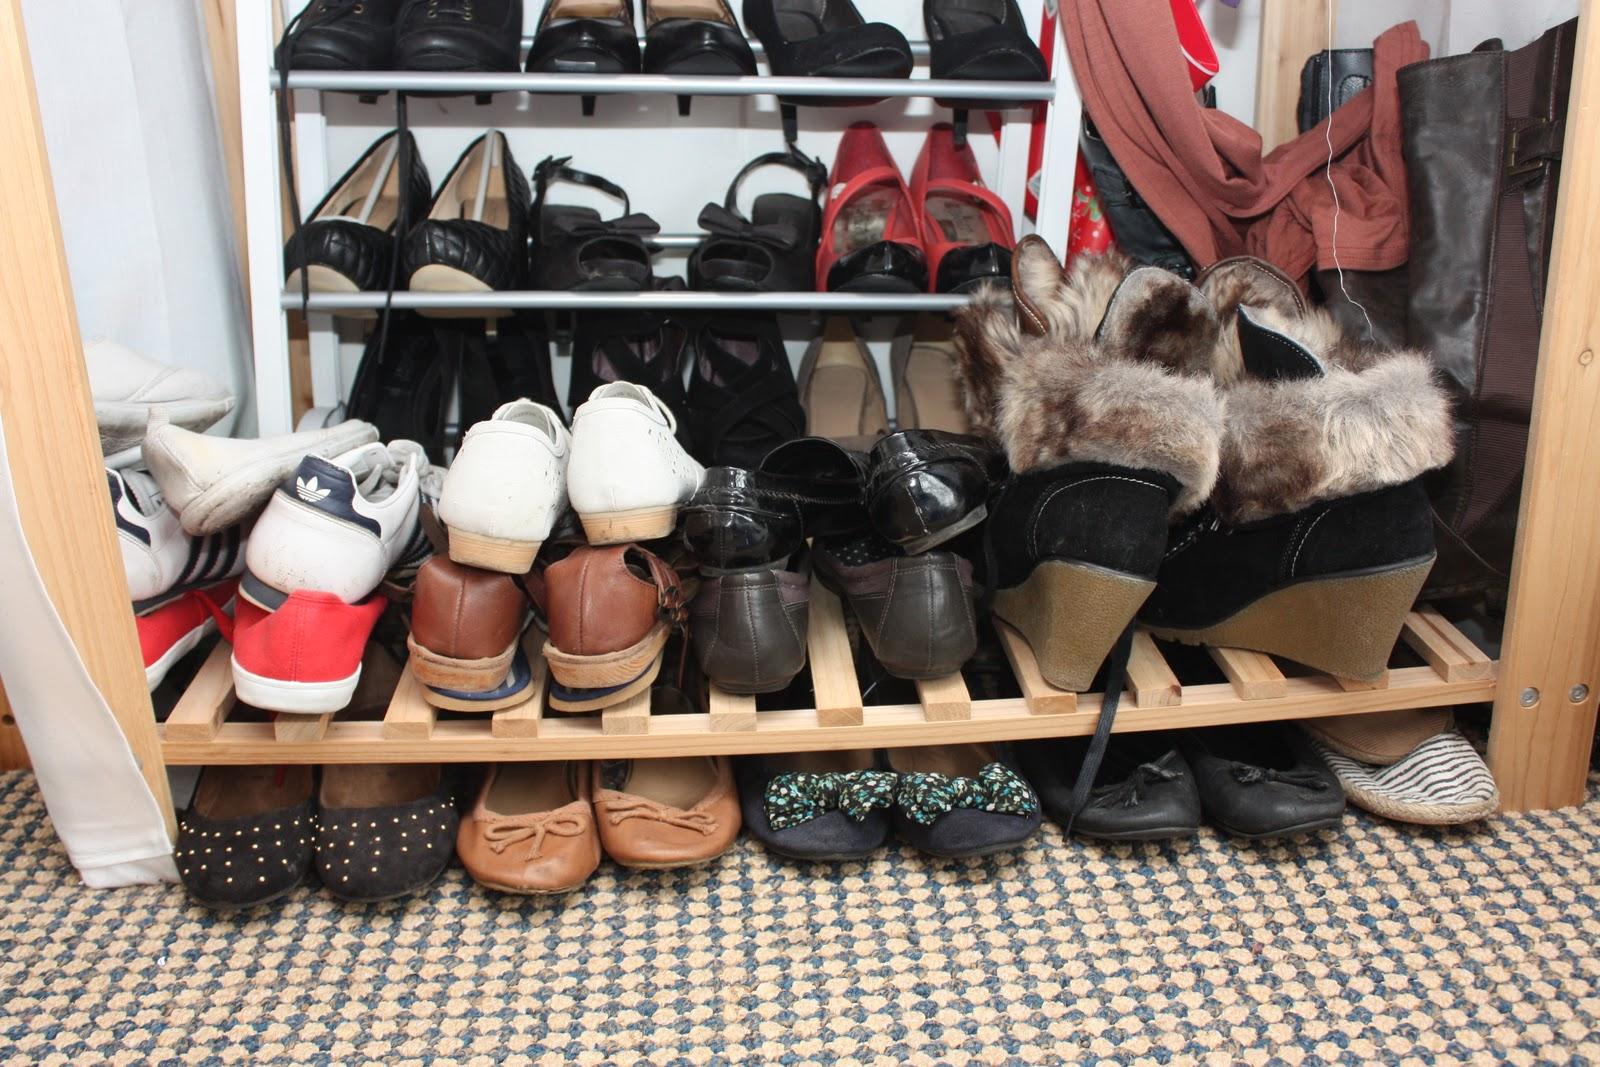 Too Many High Heels